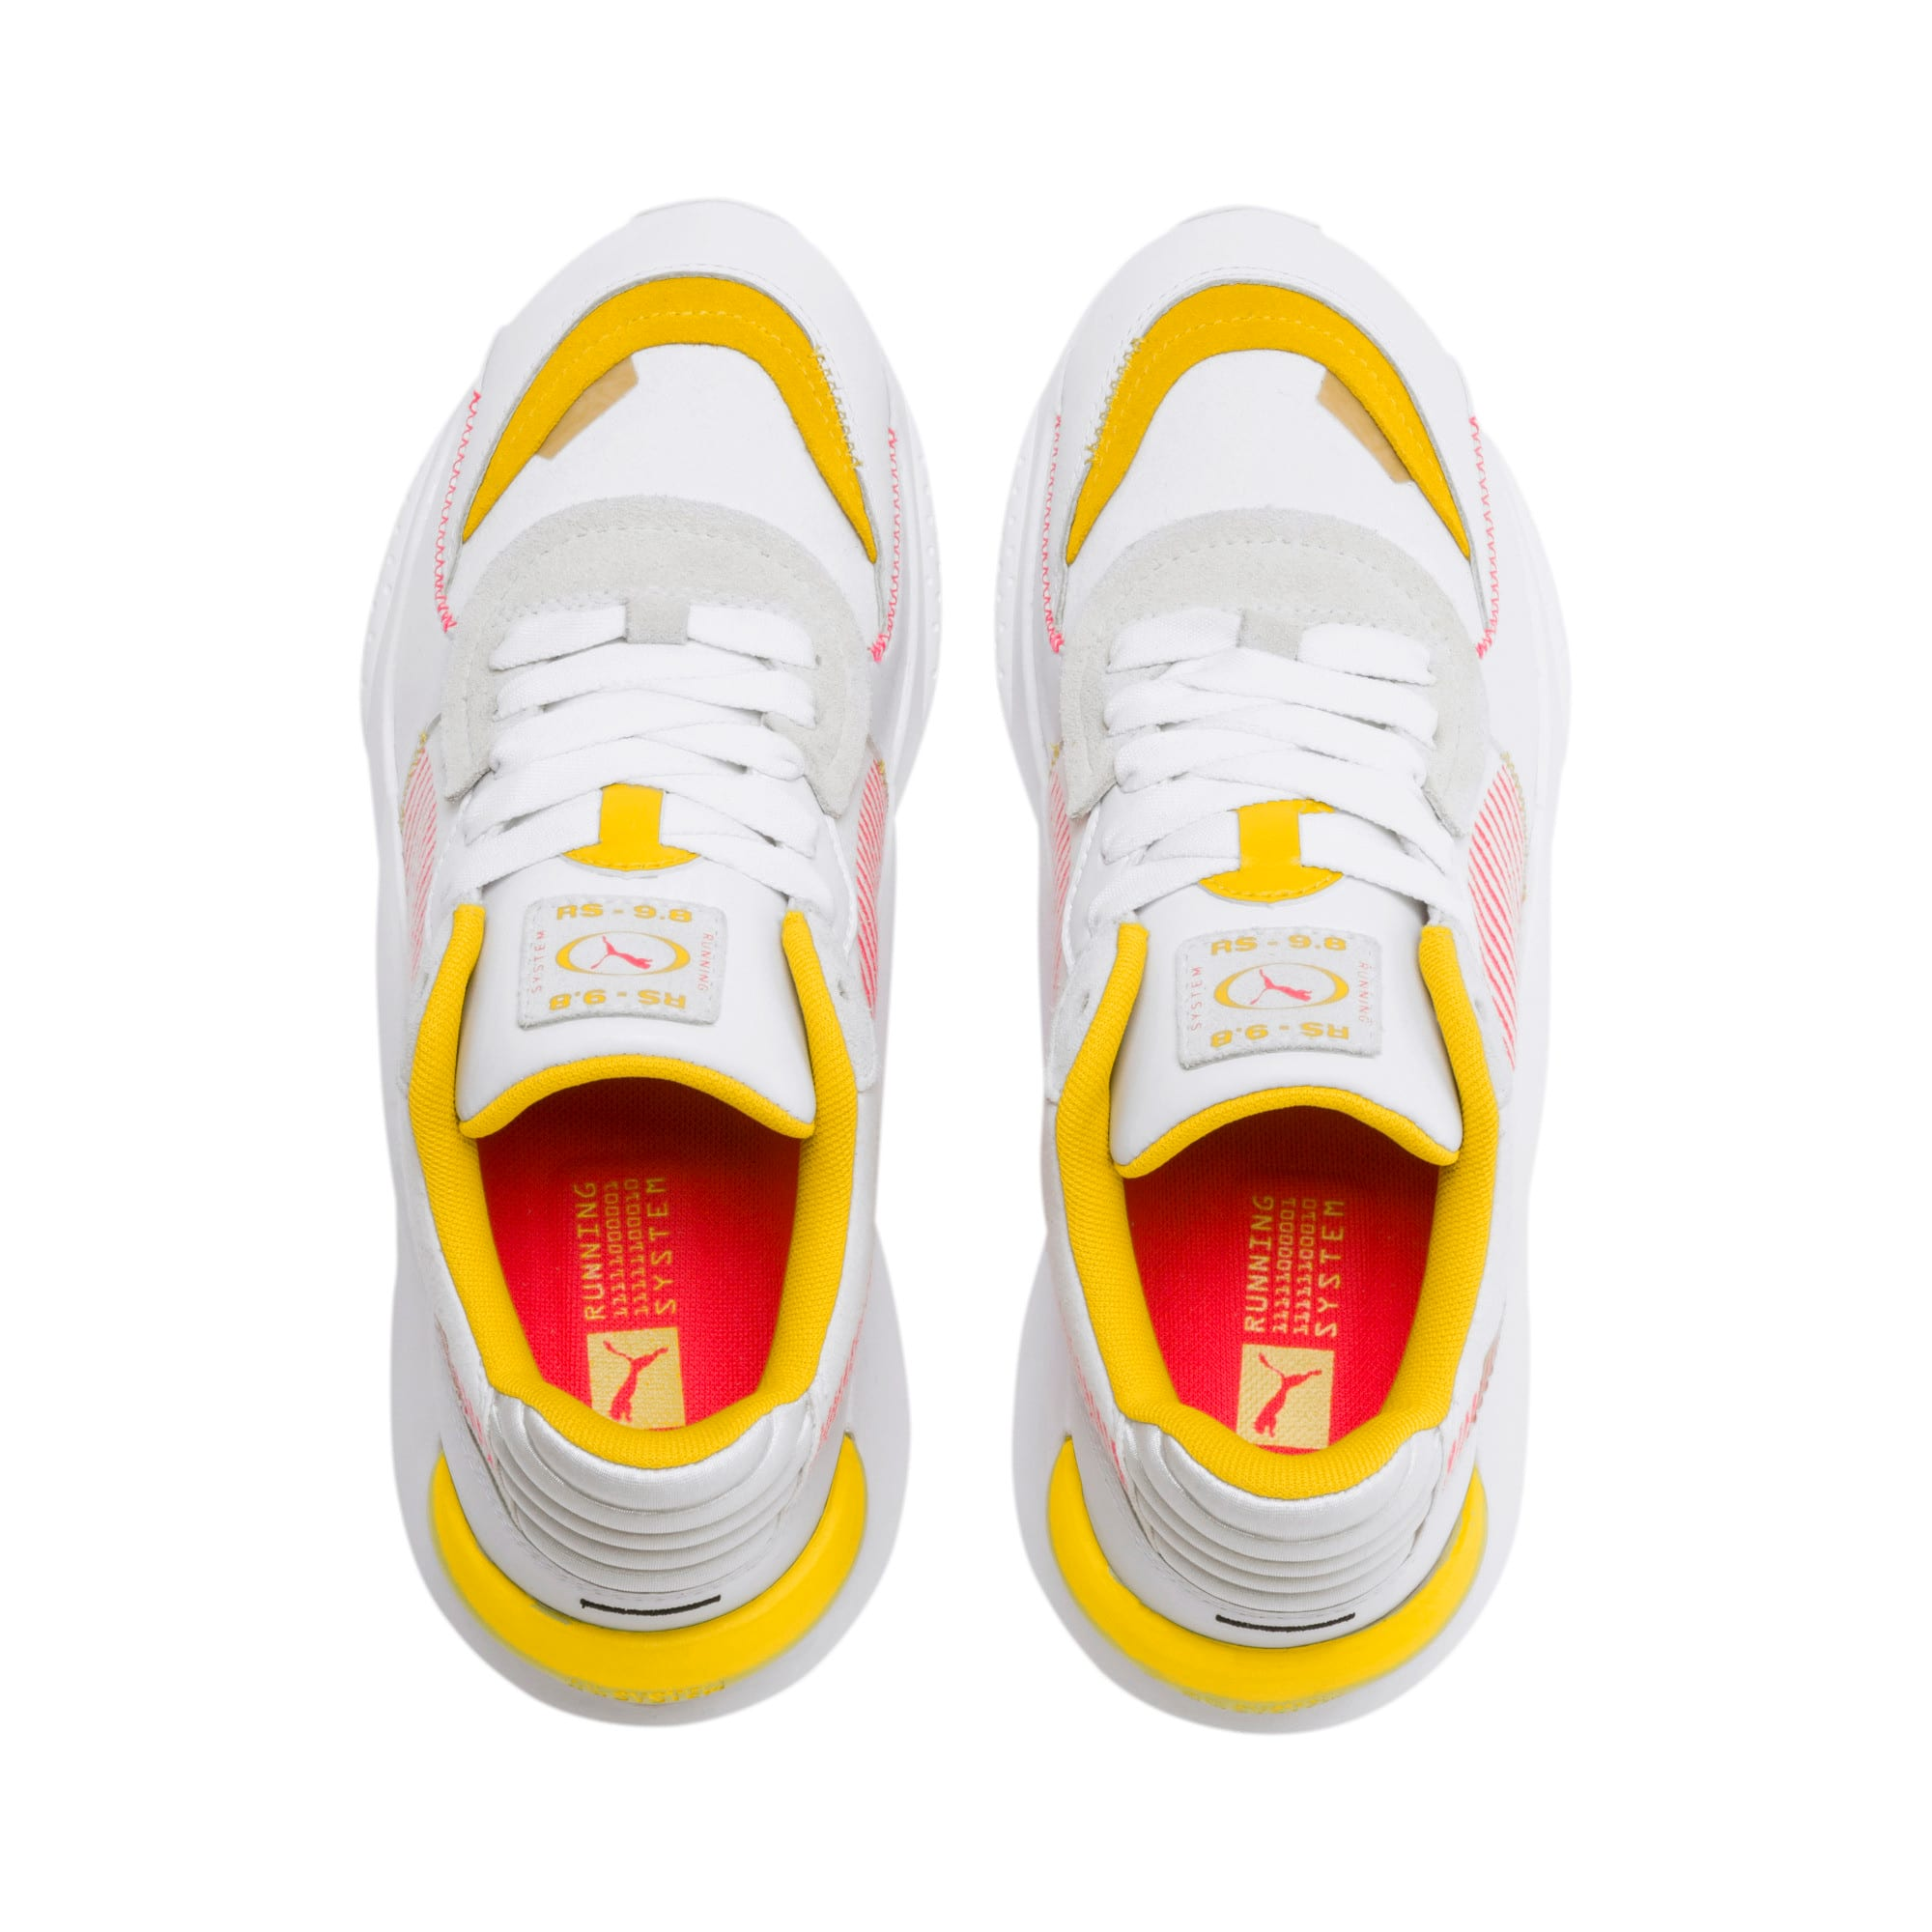 Thumbnail 7 of RS 9.8 Proto Women's Sneakers, Puma White, medium